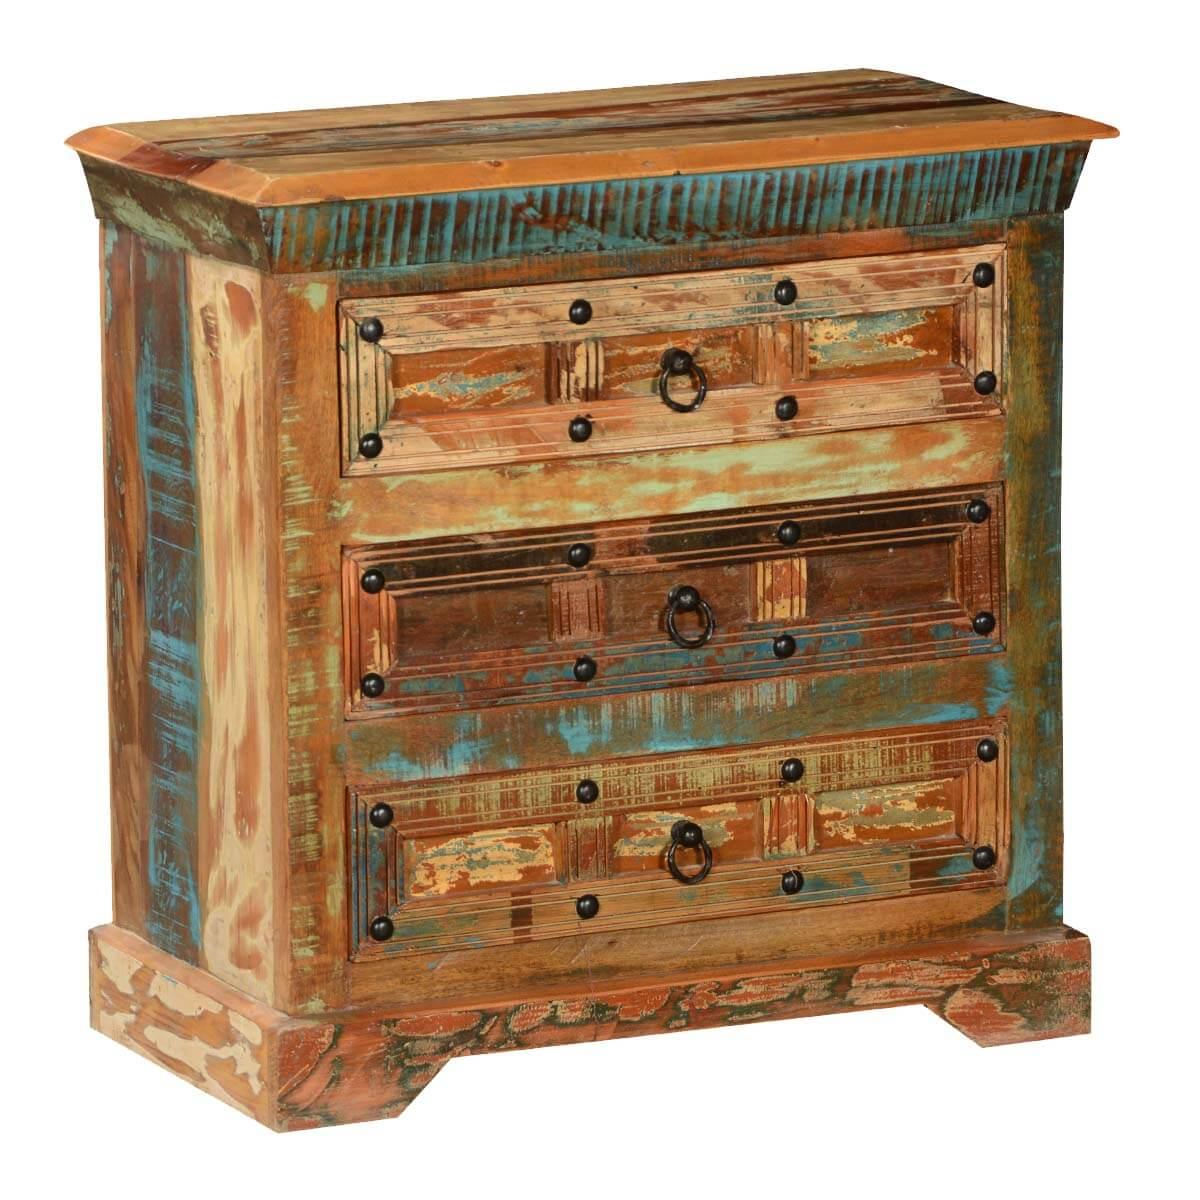 Rustic Plaid Reclaimed Wood 3 Drawer Mini Dresser Chest